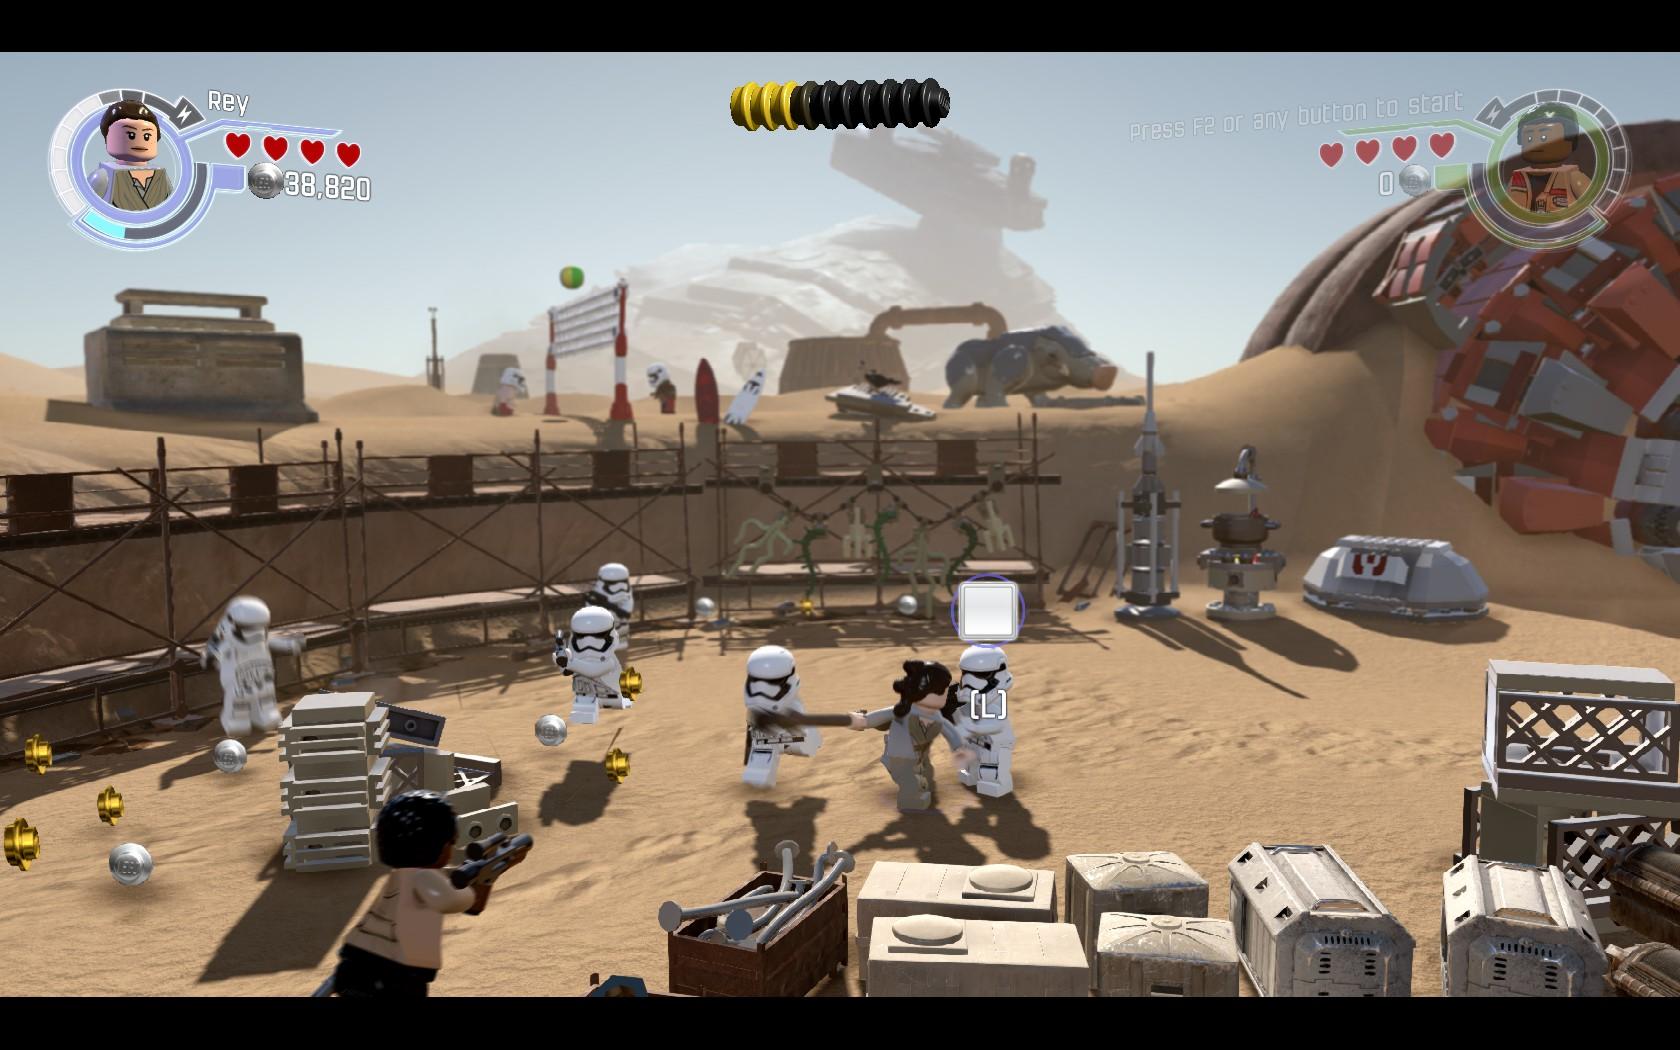 LEGO Star Wars: The Force Awakens - kostky se probouzí 126753